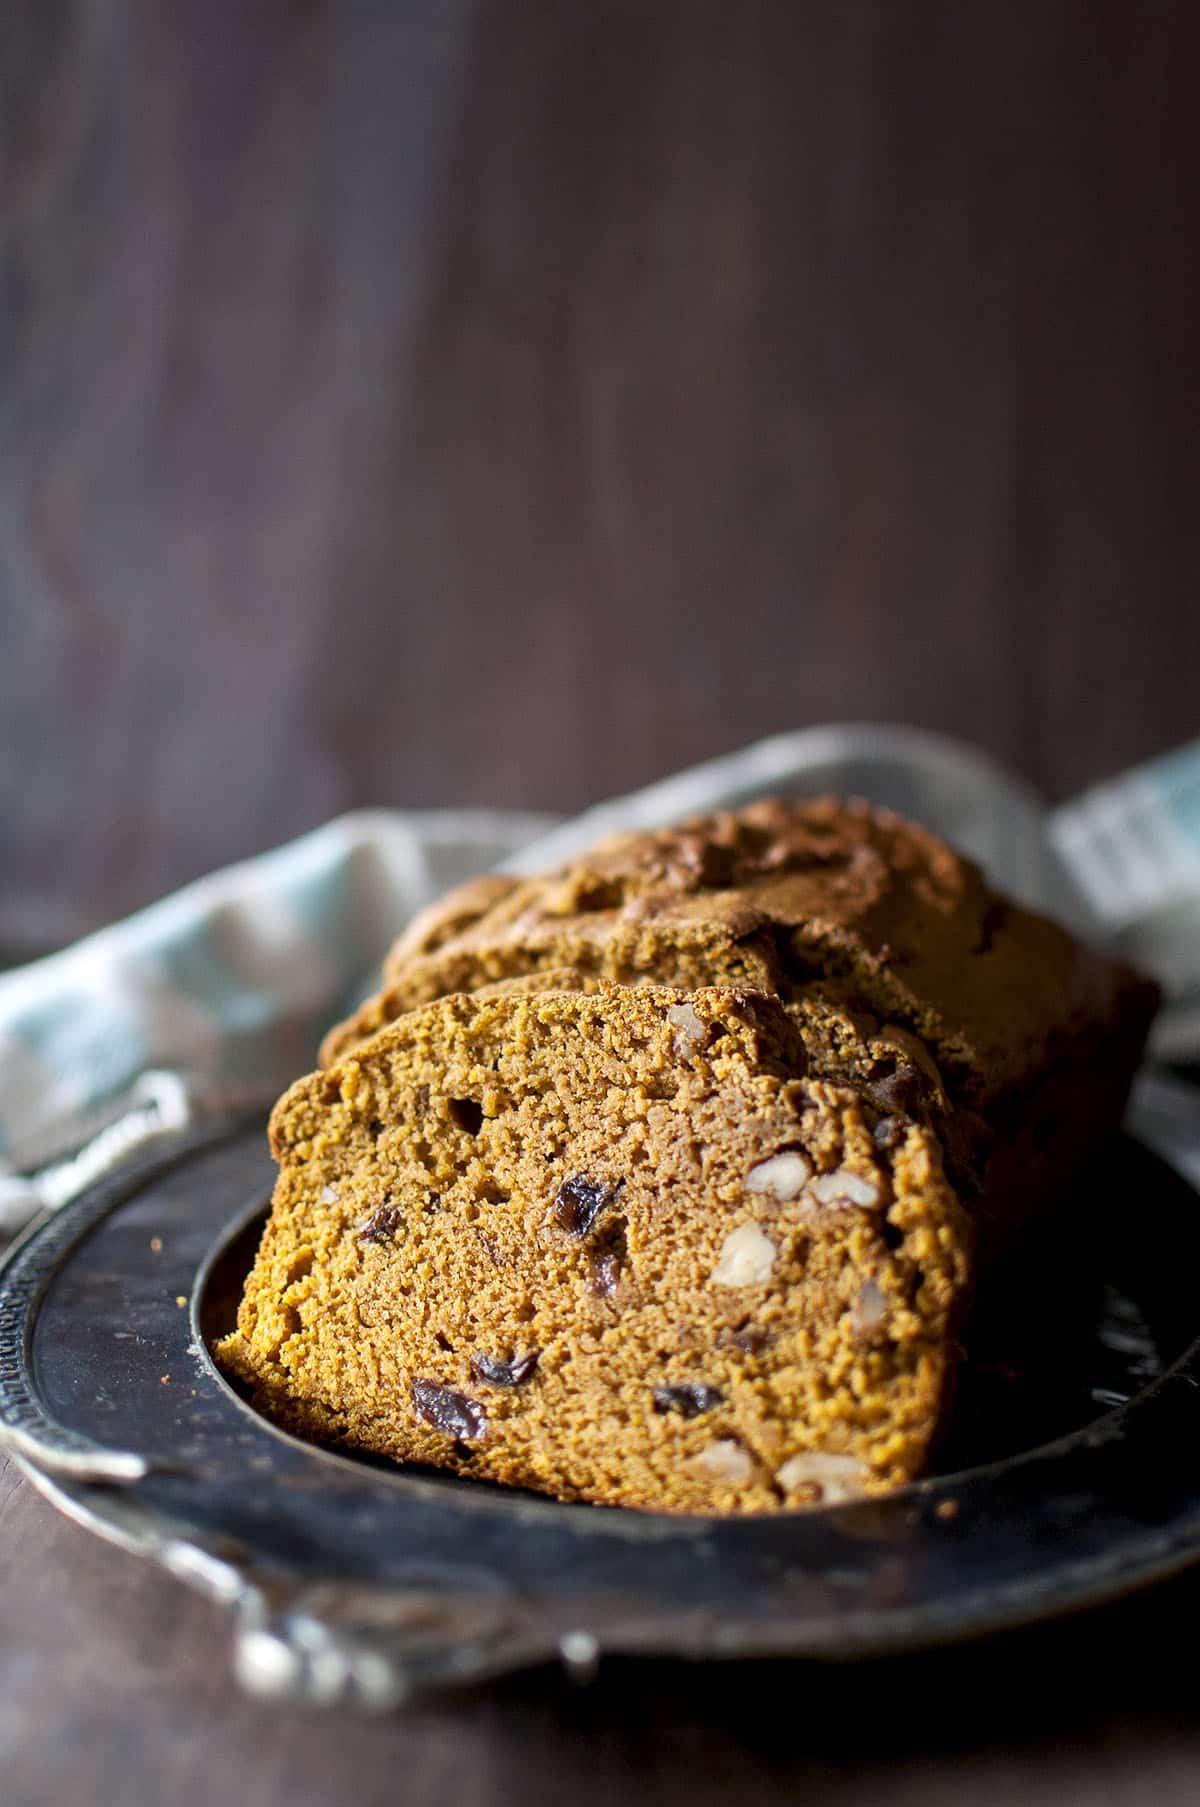 Plate with slices of raisin & walnut studded sourdough pumpkin bread